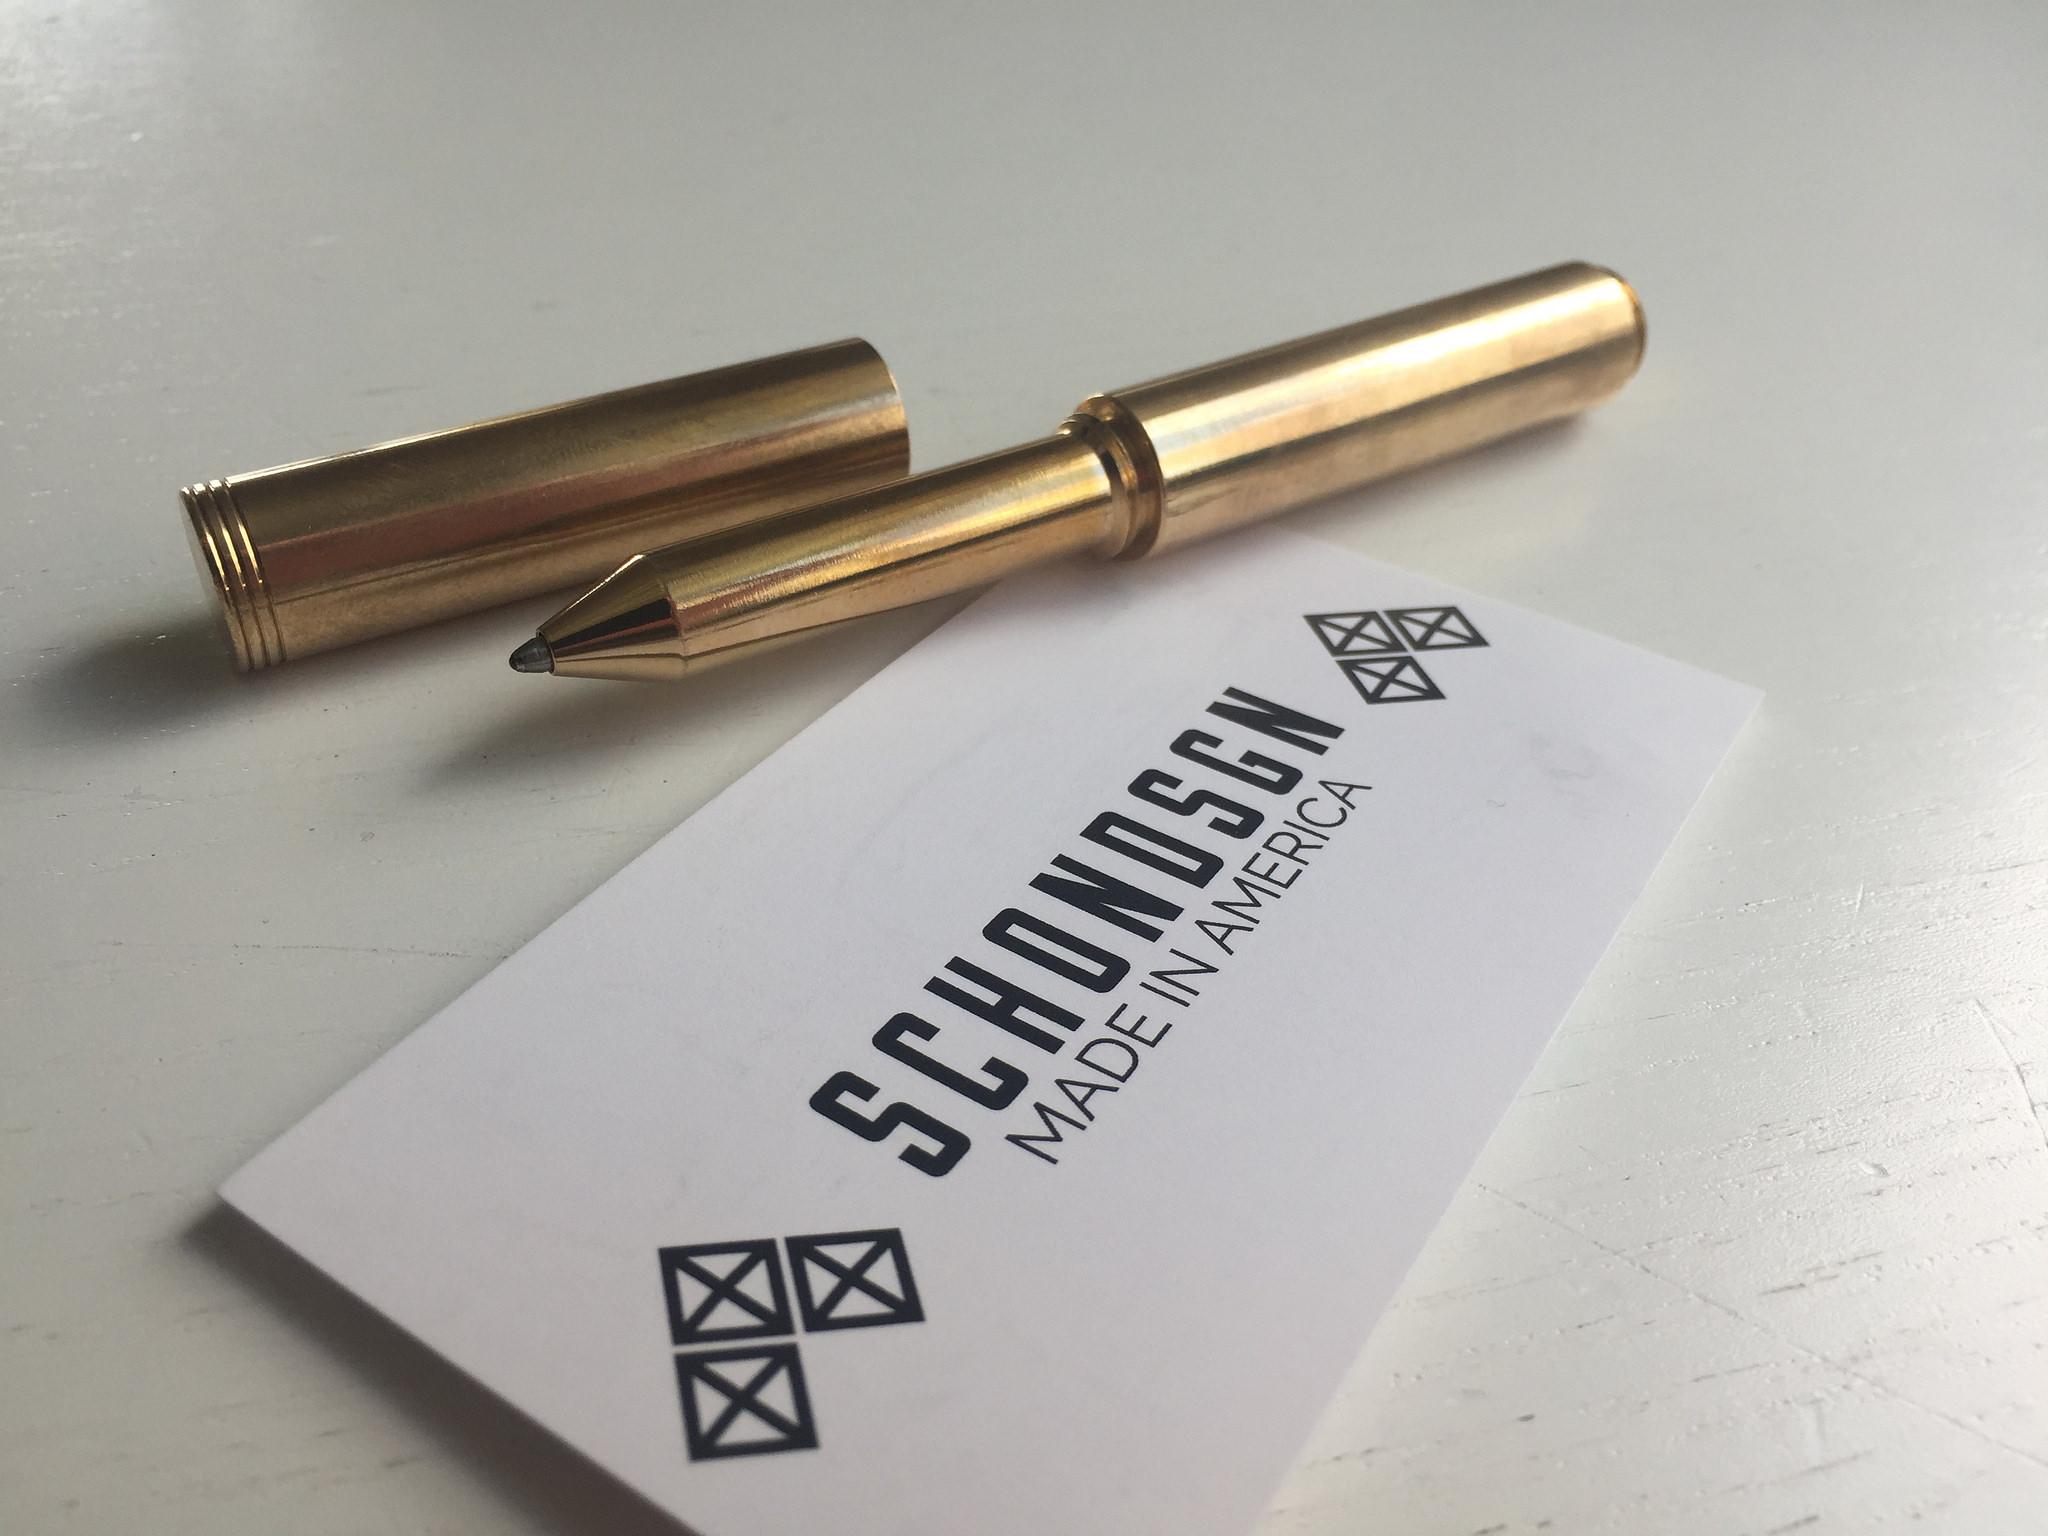 Schon DSGN pen